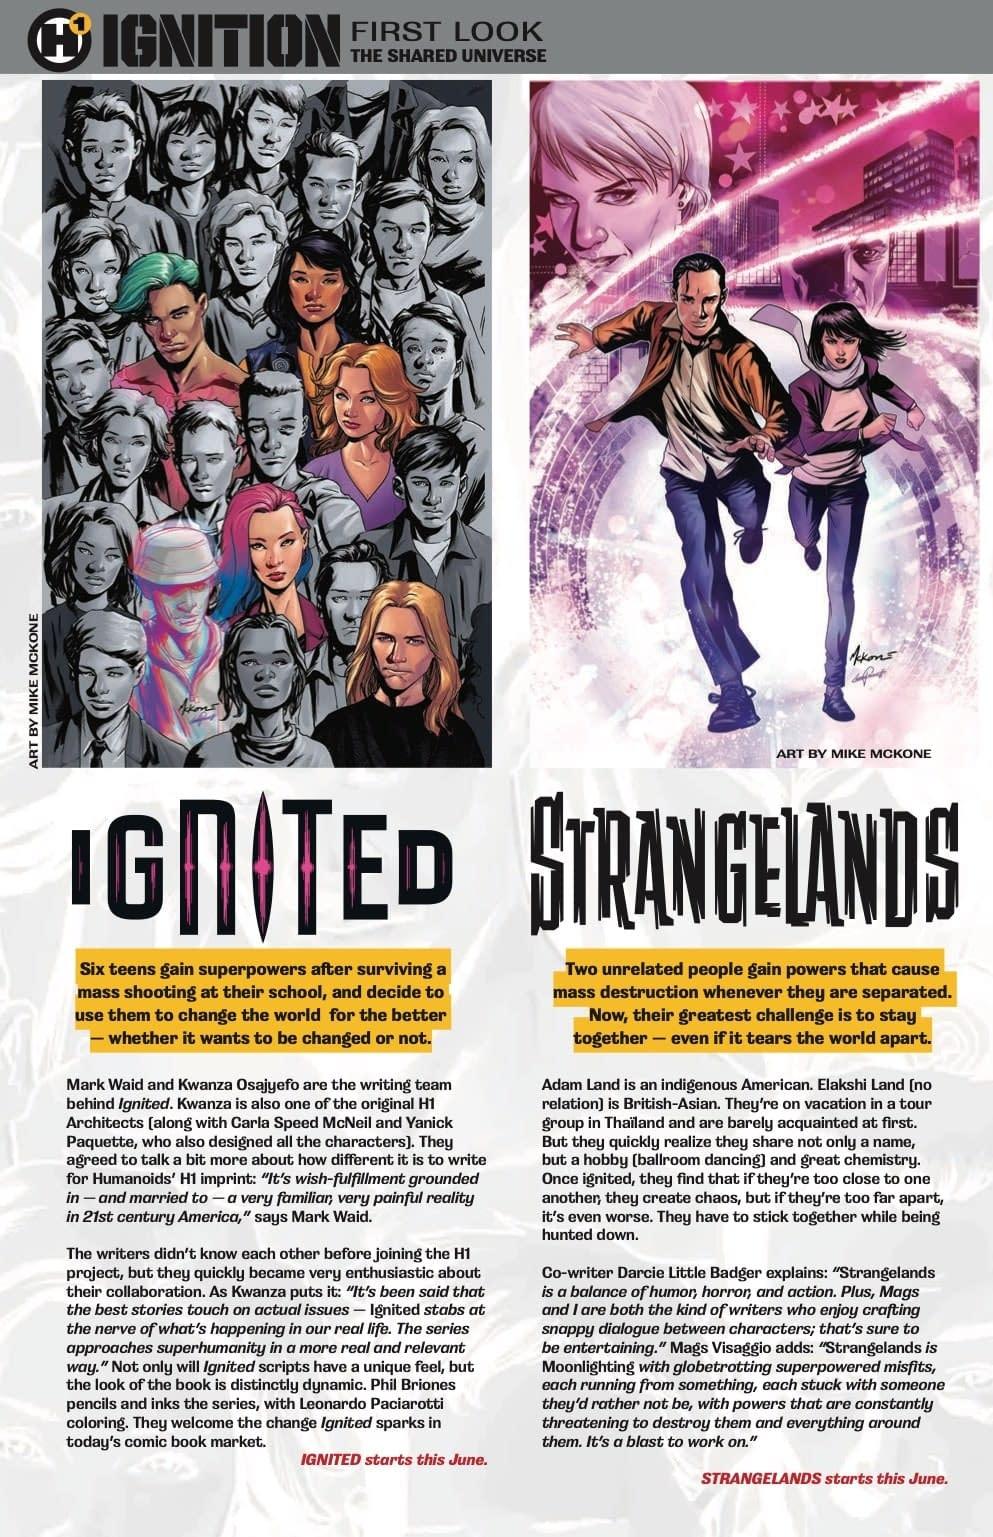 Magdalene Visaggio, Darcie Little Badger, & Khoi Pham Join Humanoids H1 with Strangelands